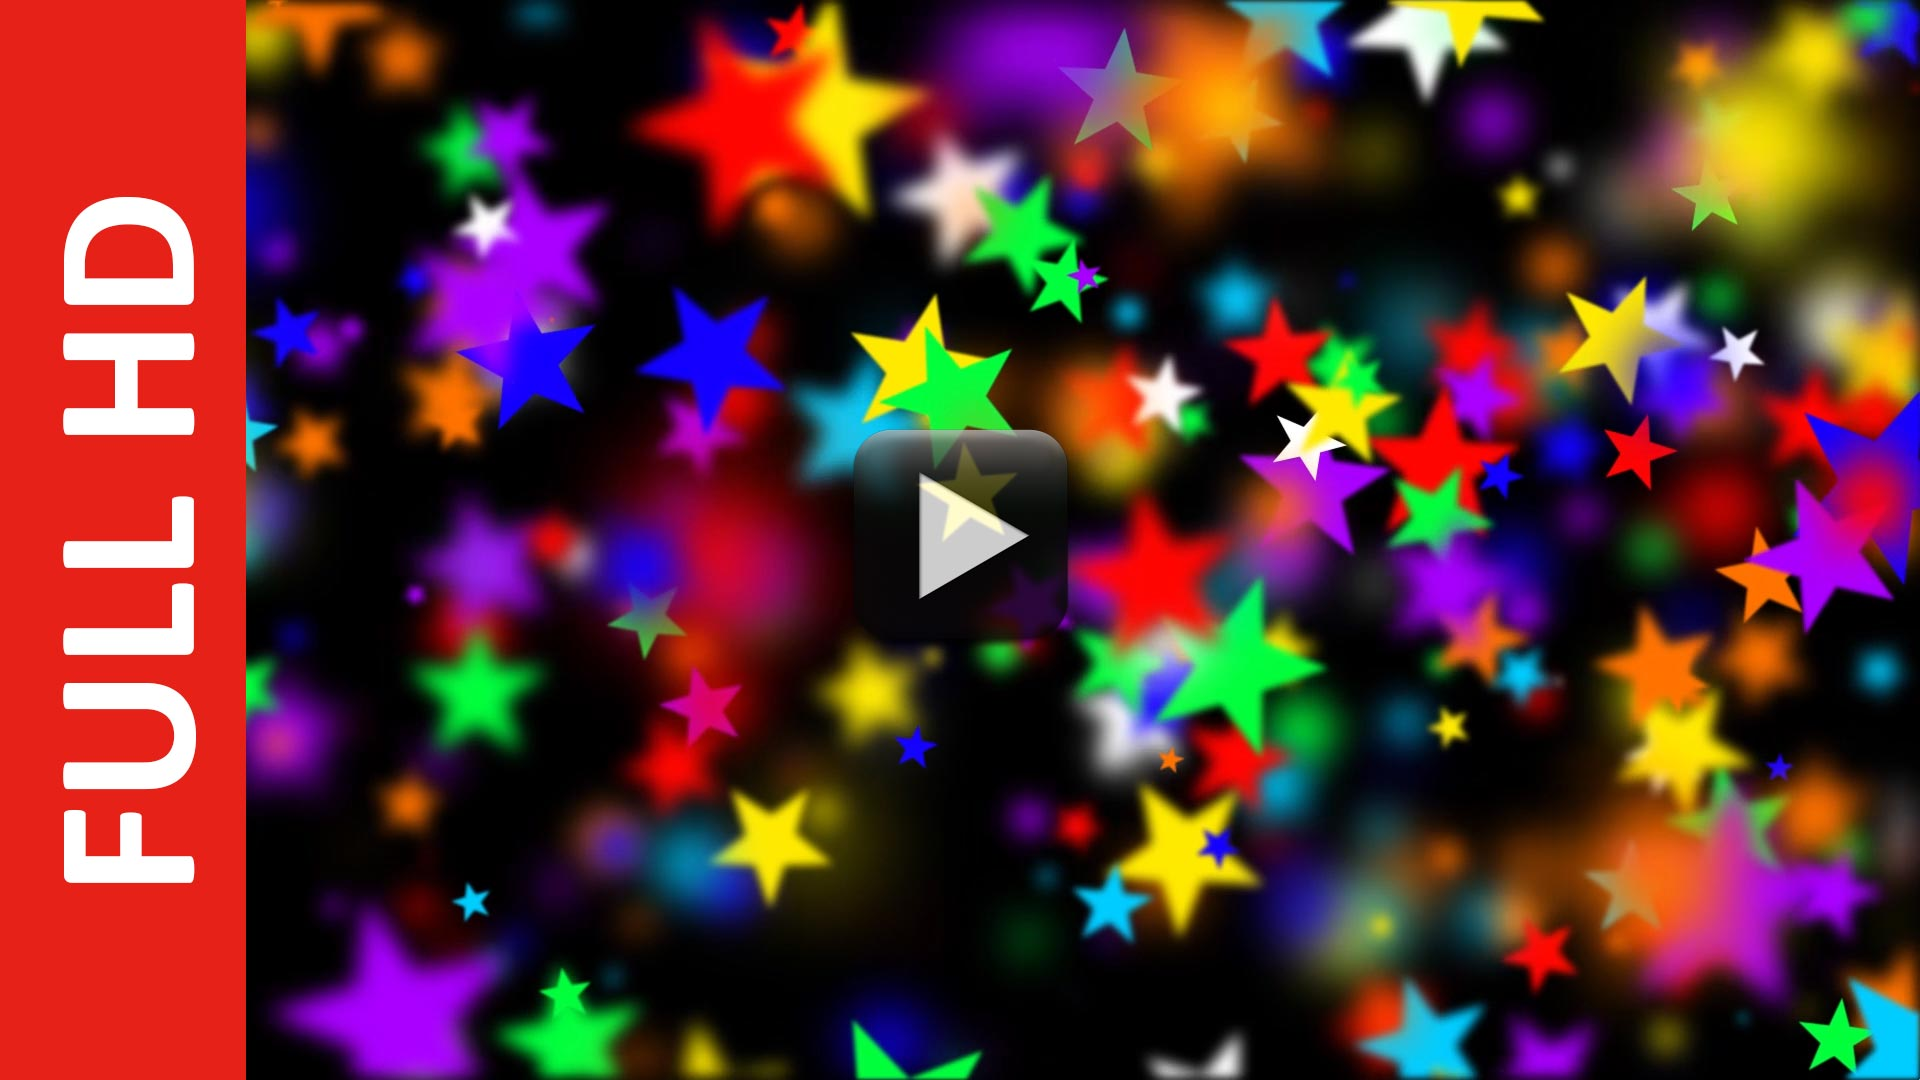 Stars Free HD Motion Background